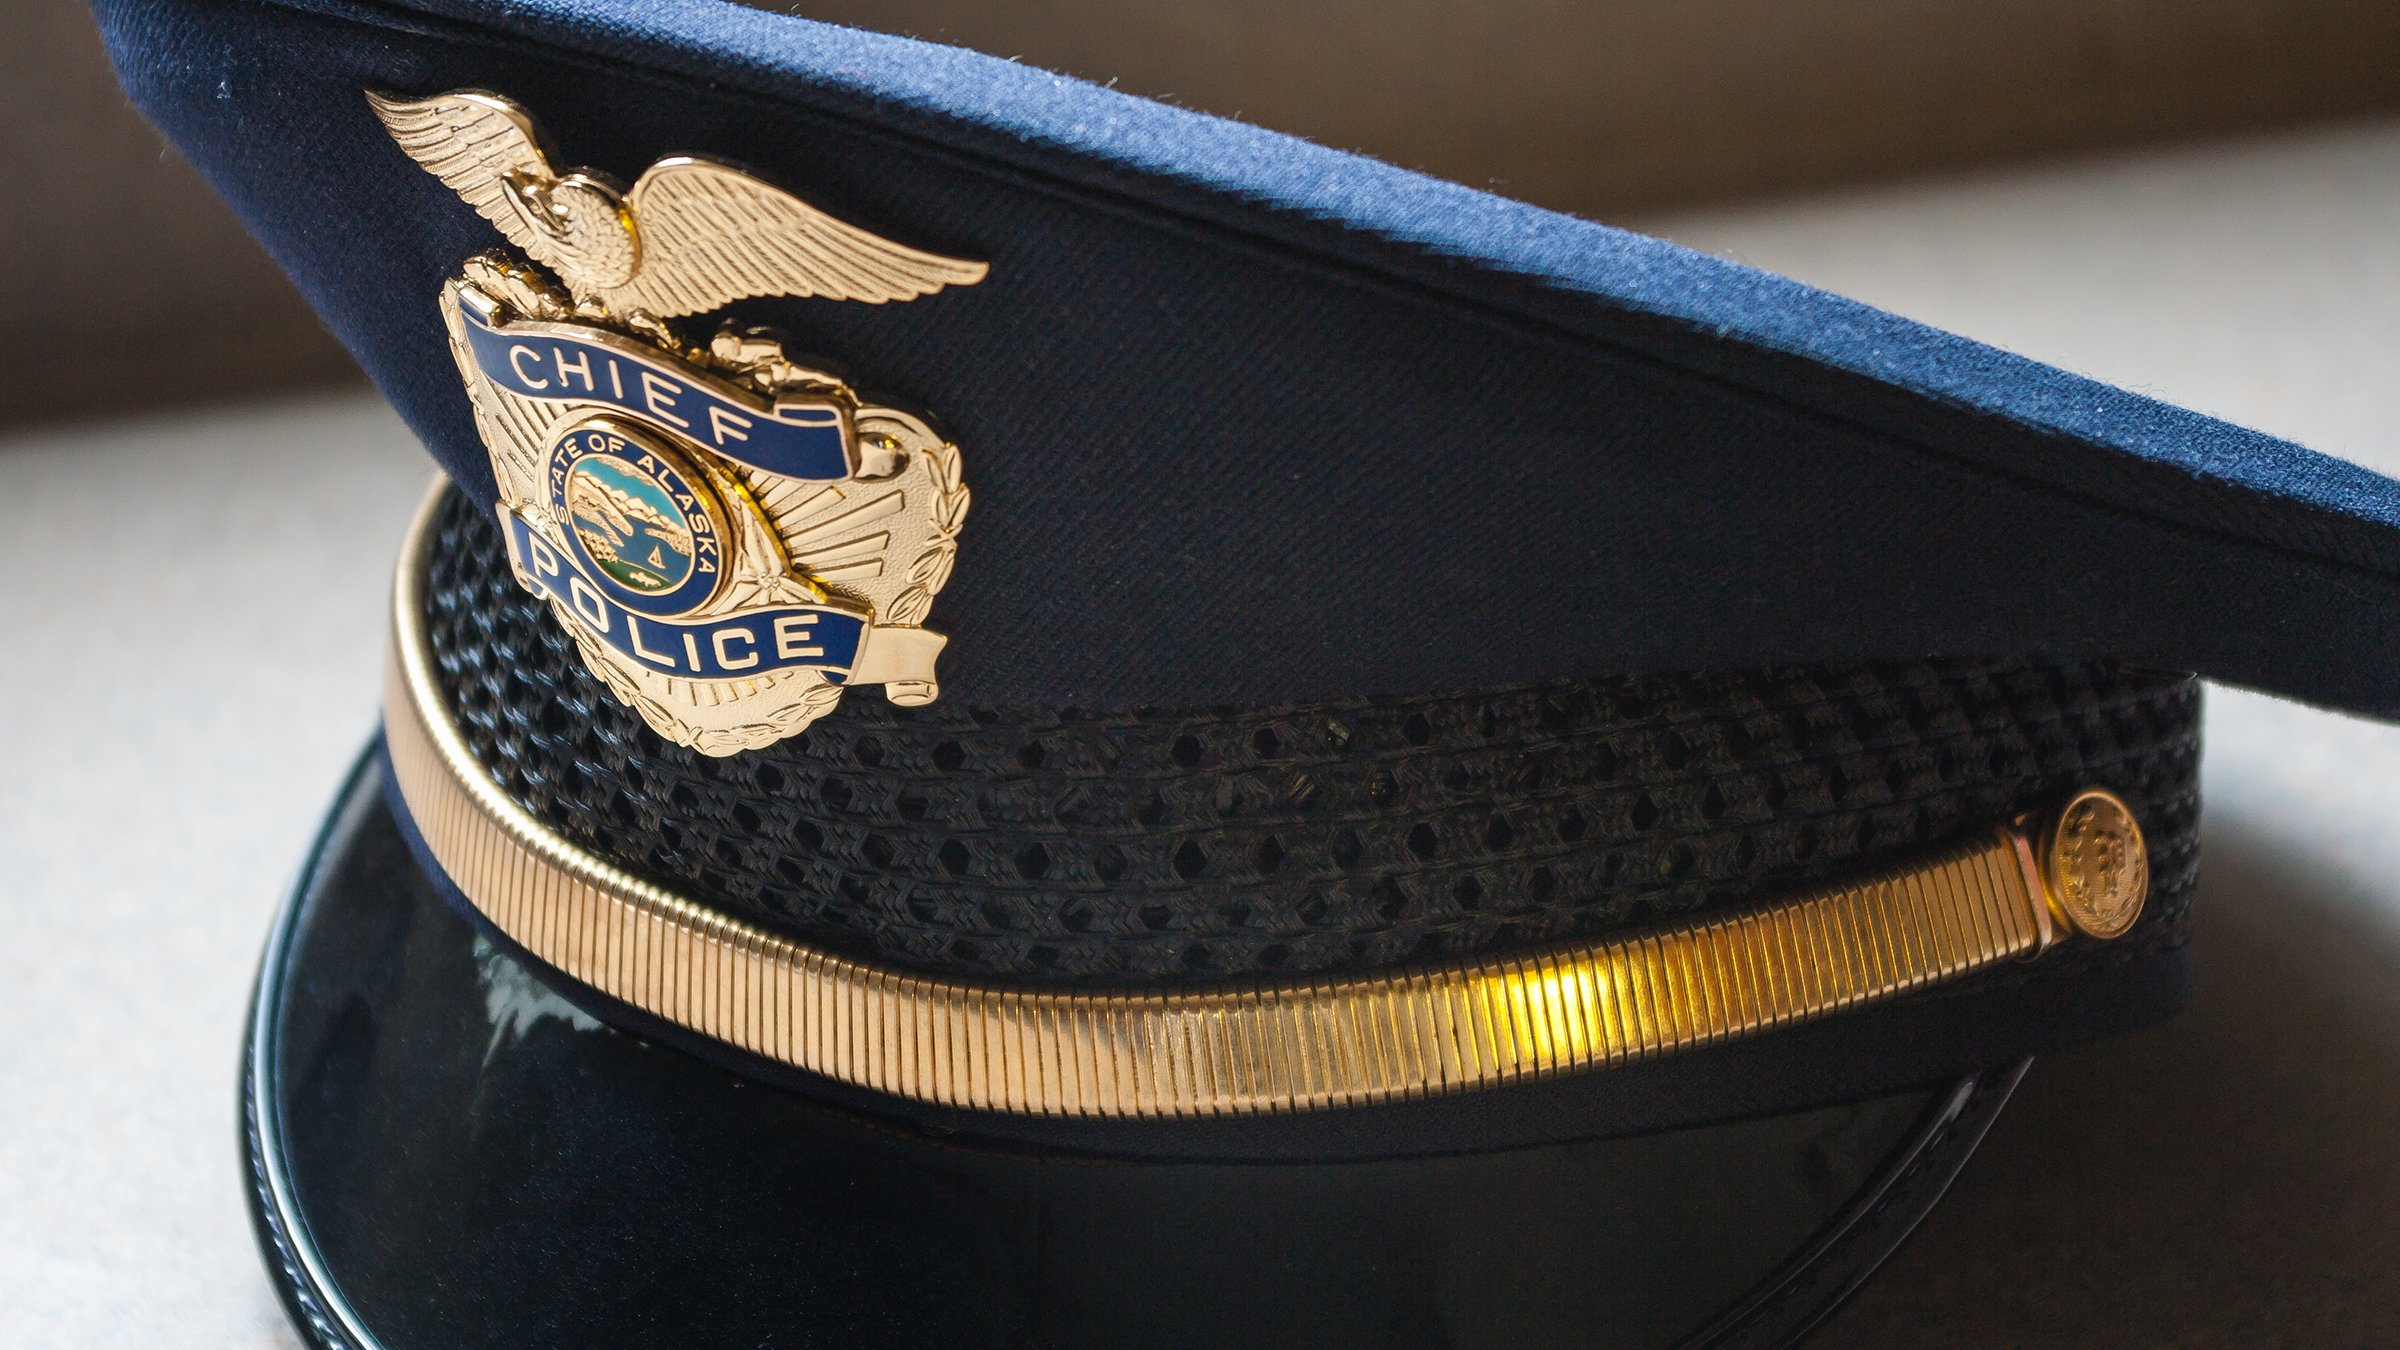 The National Employee Survey - Law Enforcement 2